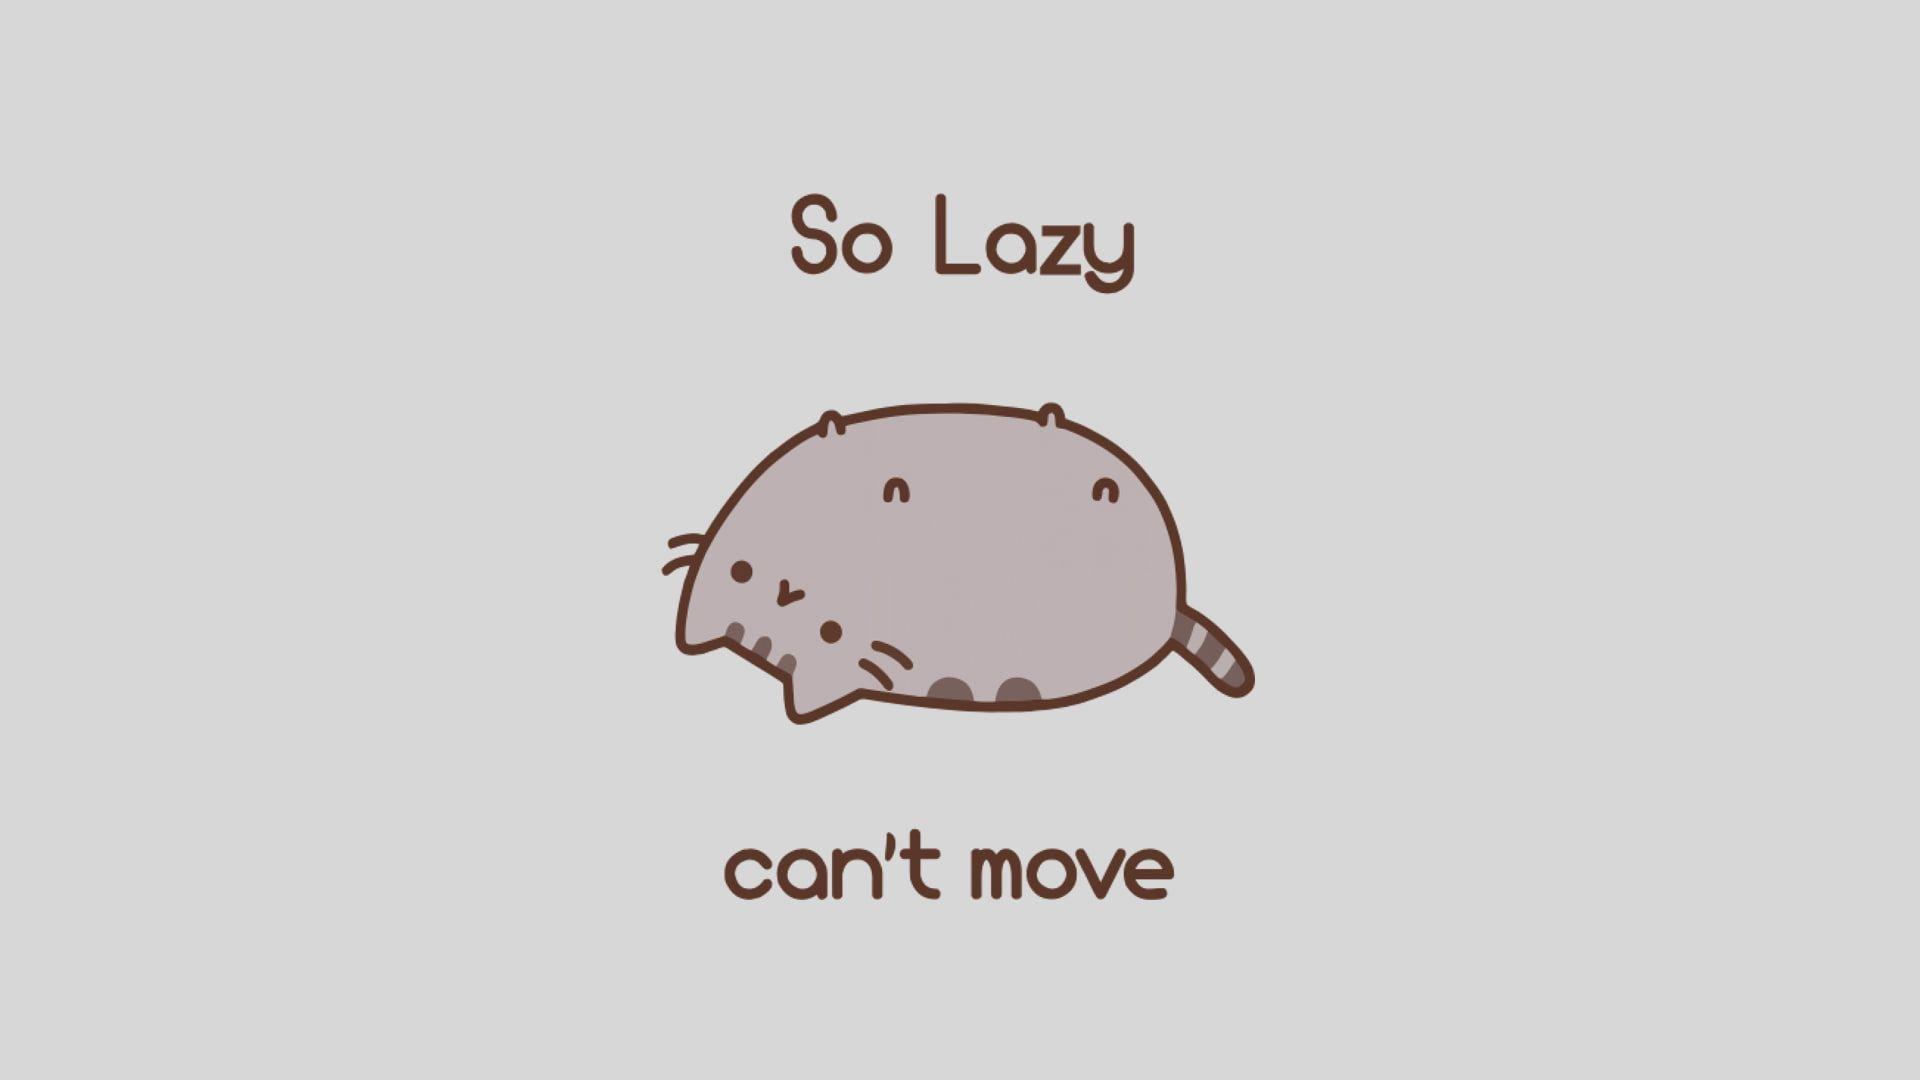 Pusheen Lazy Cat Memes Humor Minimalism Typography Simple Background Animals Cartoon 1080p Wallpaper Hd Meme Background Pusheen Simple Backgrounds